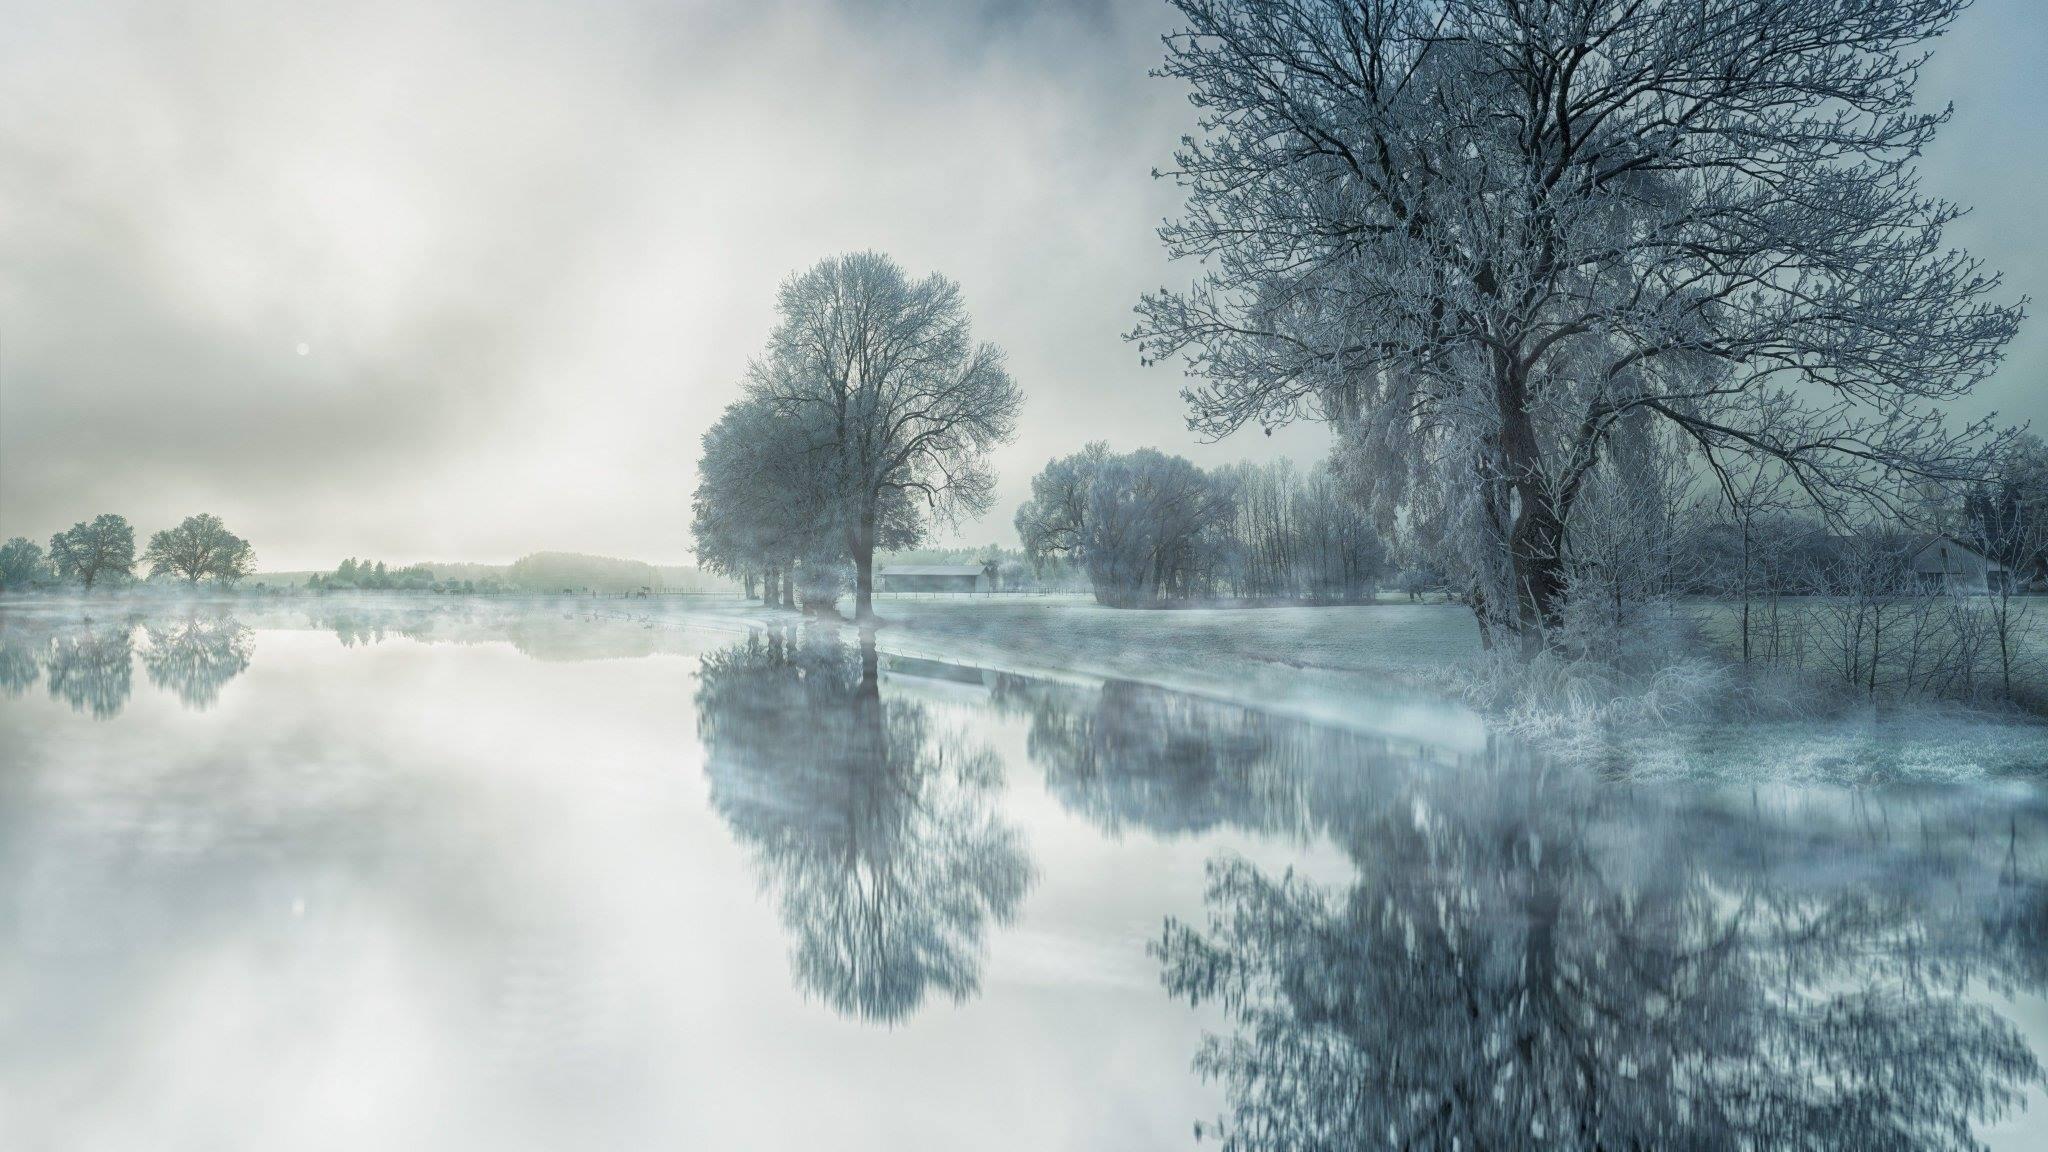 winter trees landscape water reflection